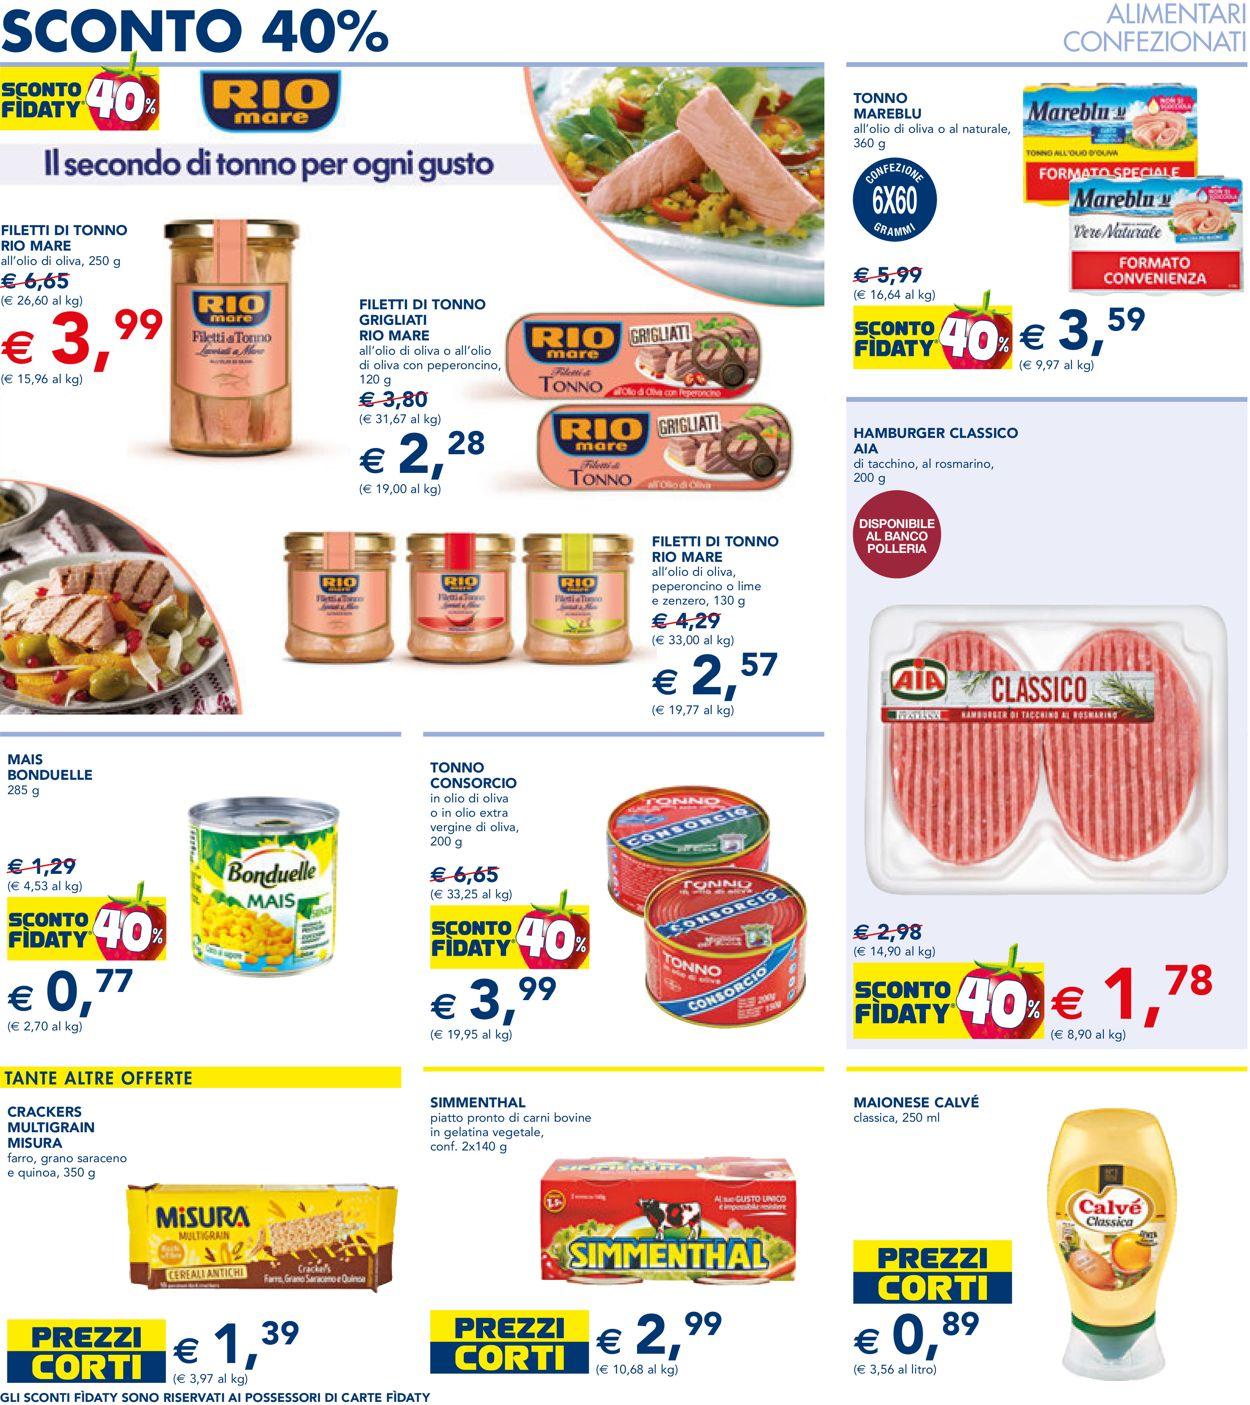 Volantino Esselunga - Offerte 06/08-19/08/2020 (Pagina 4)